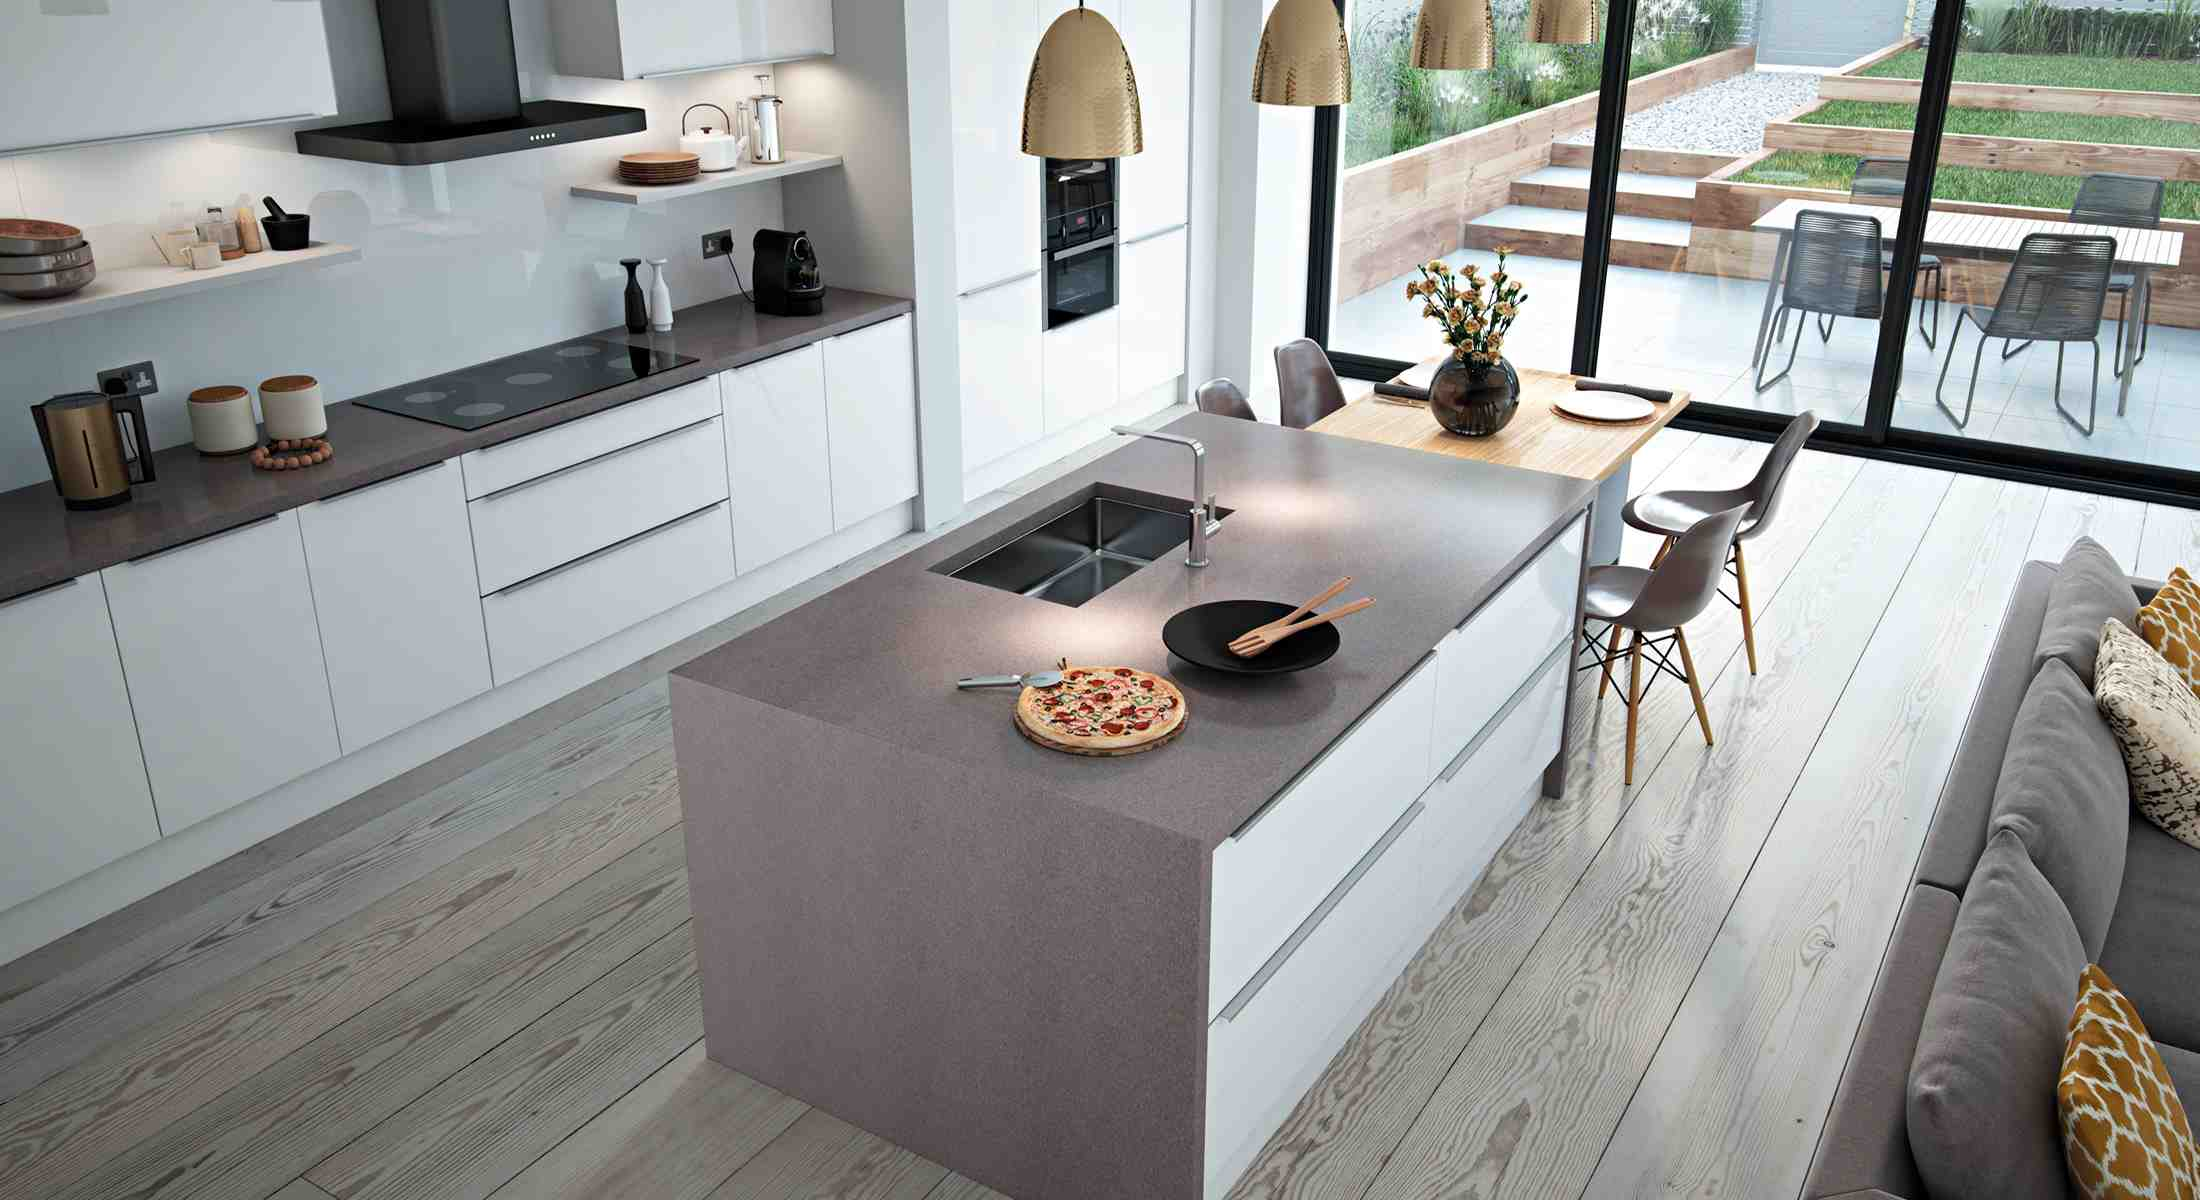 kitchens in burryport, wales by steve williams - vassa gloss